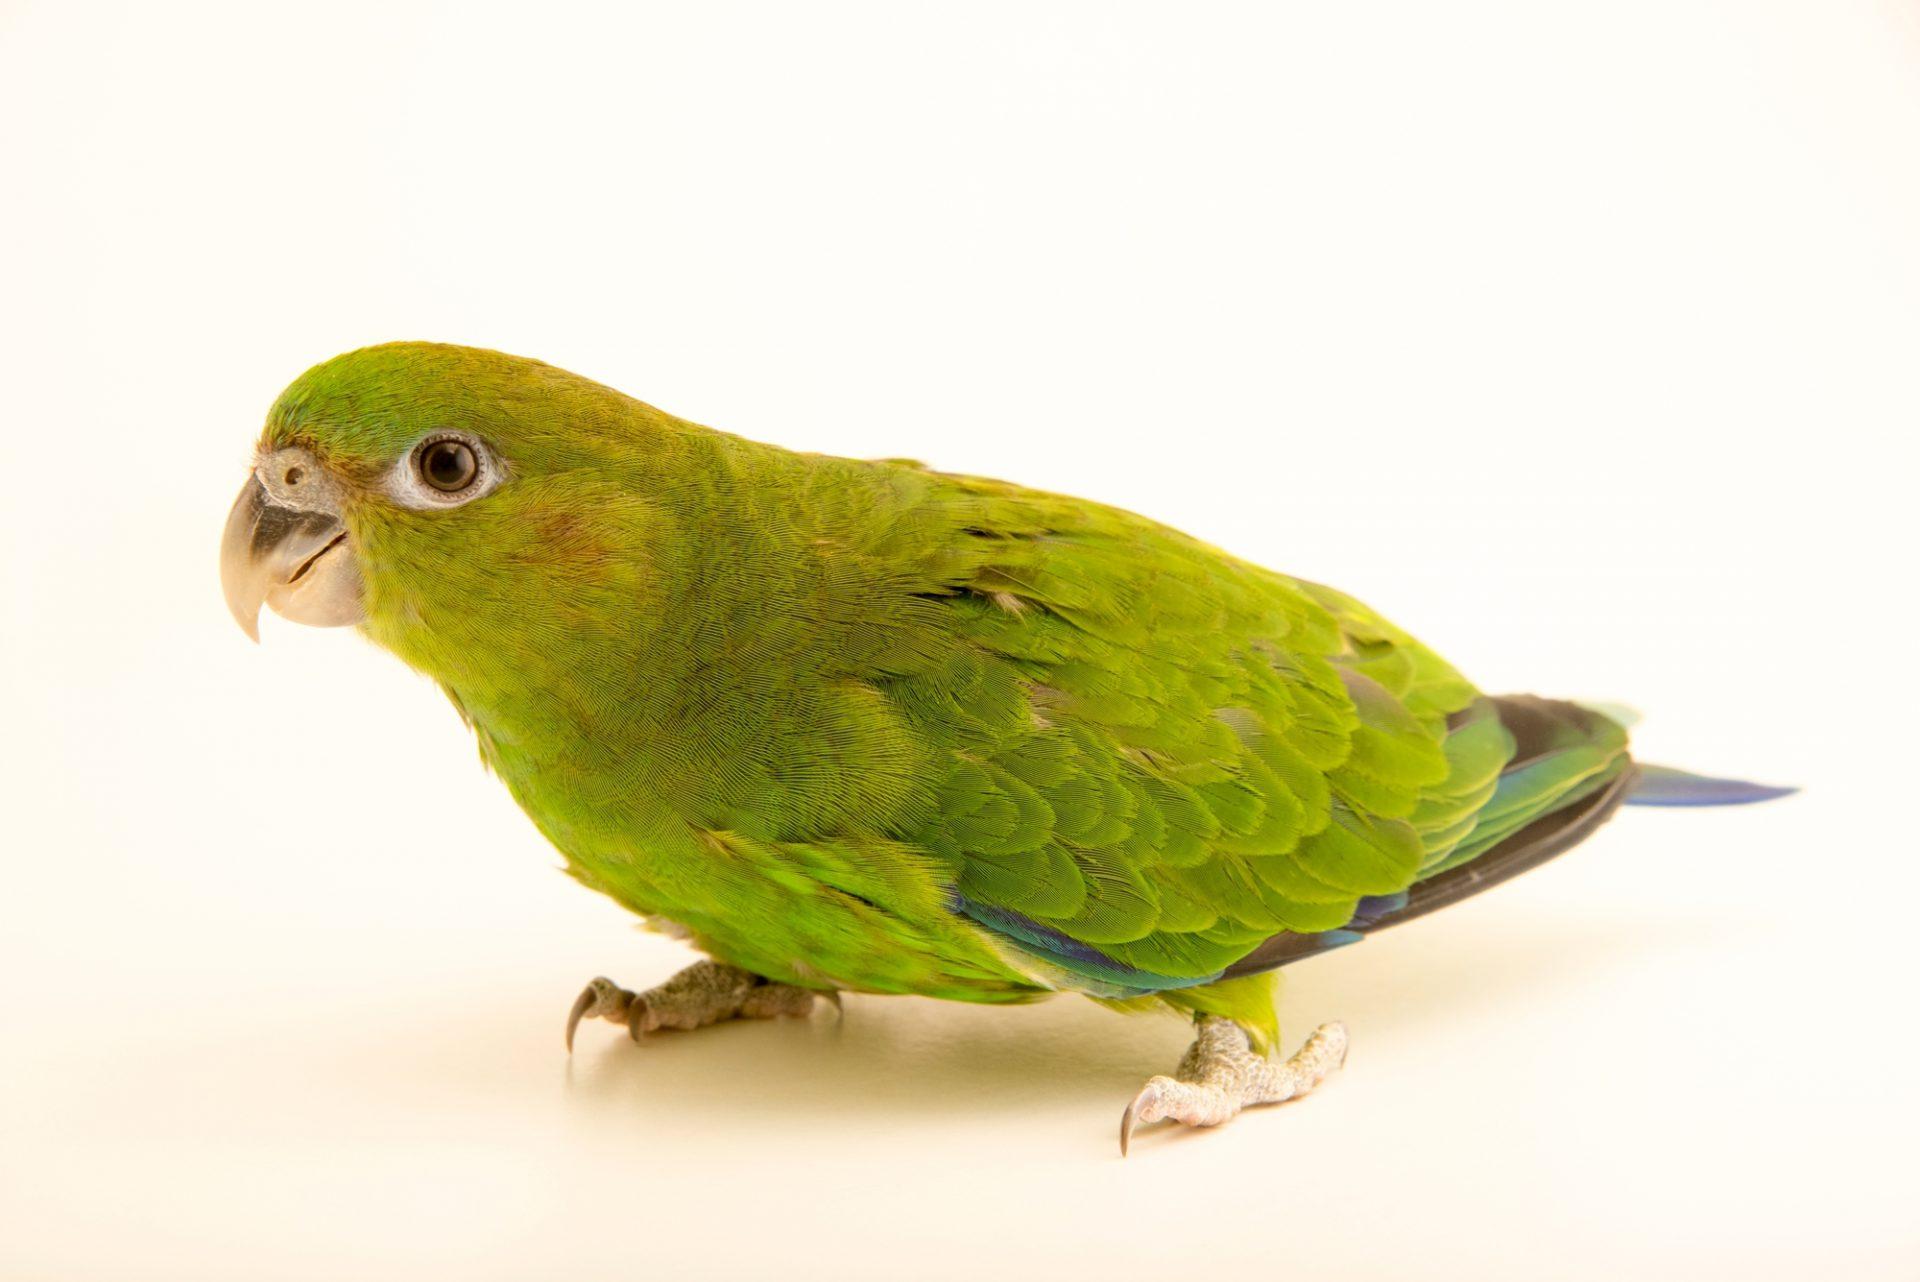 Photo: A female pileated parrot, Pionopsitta pileata, at Loro Parque Fundacion.